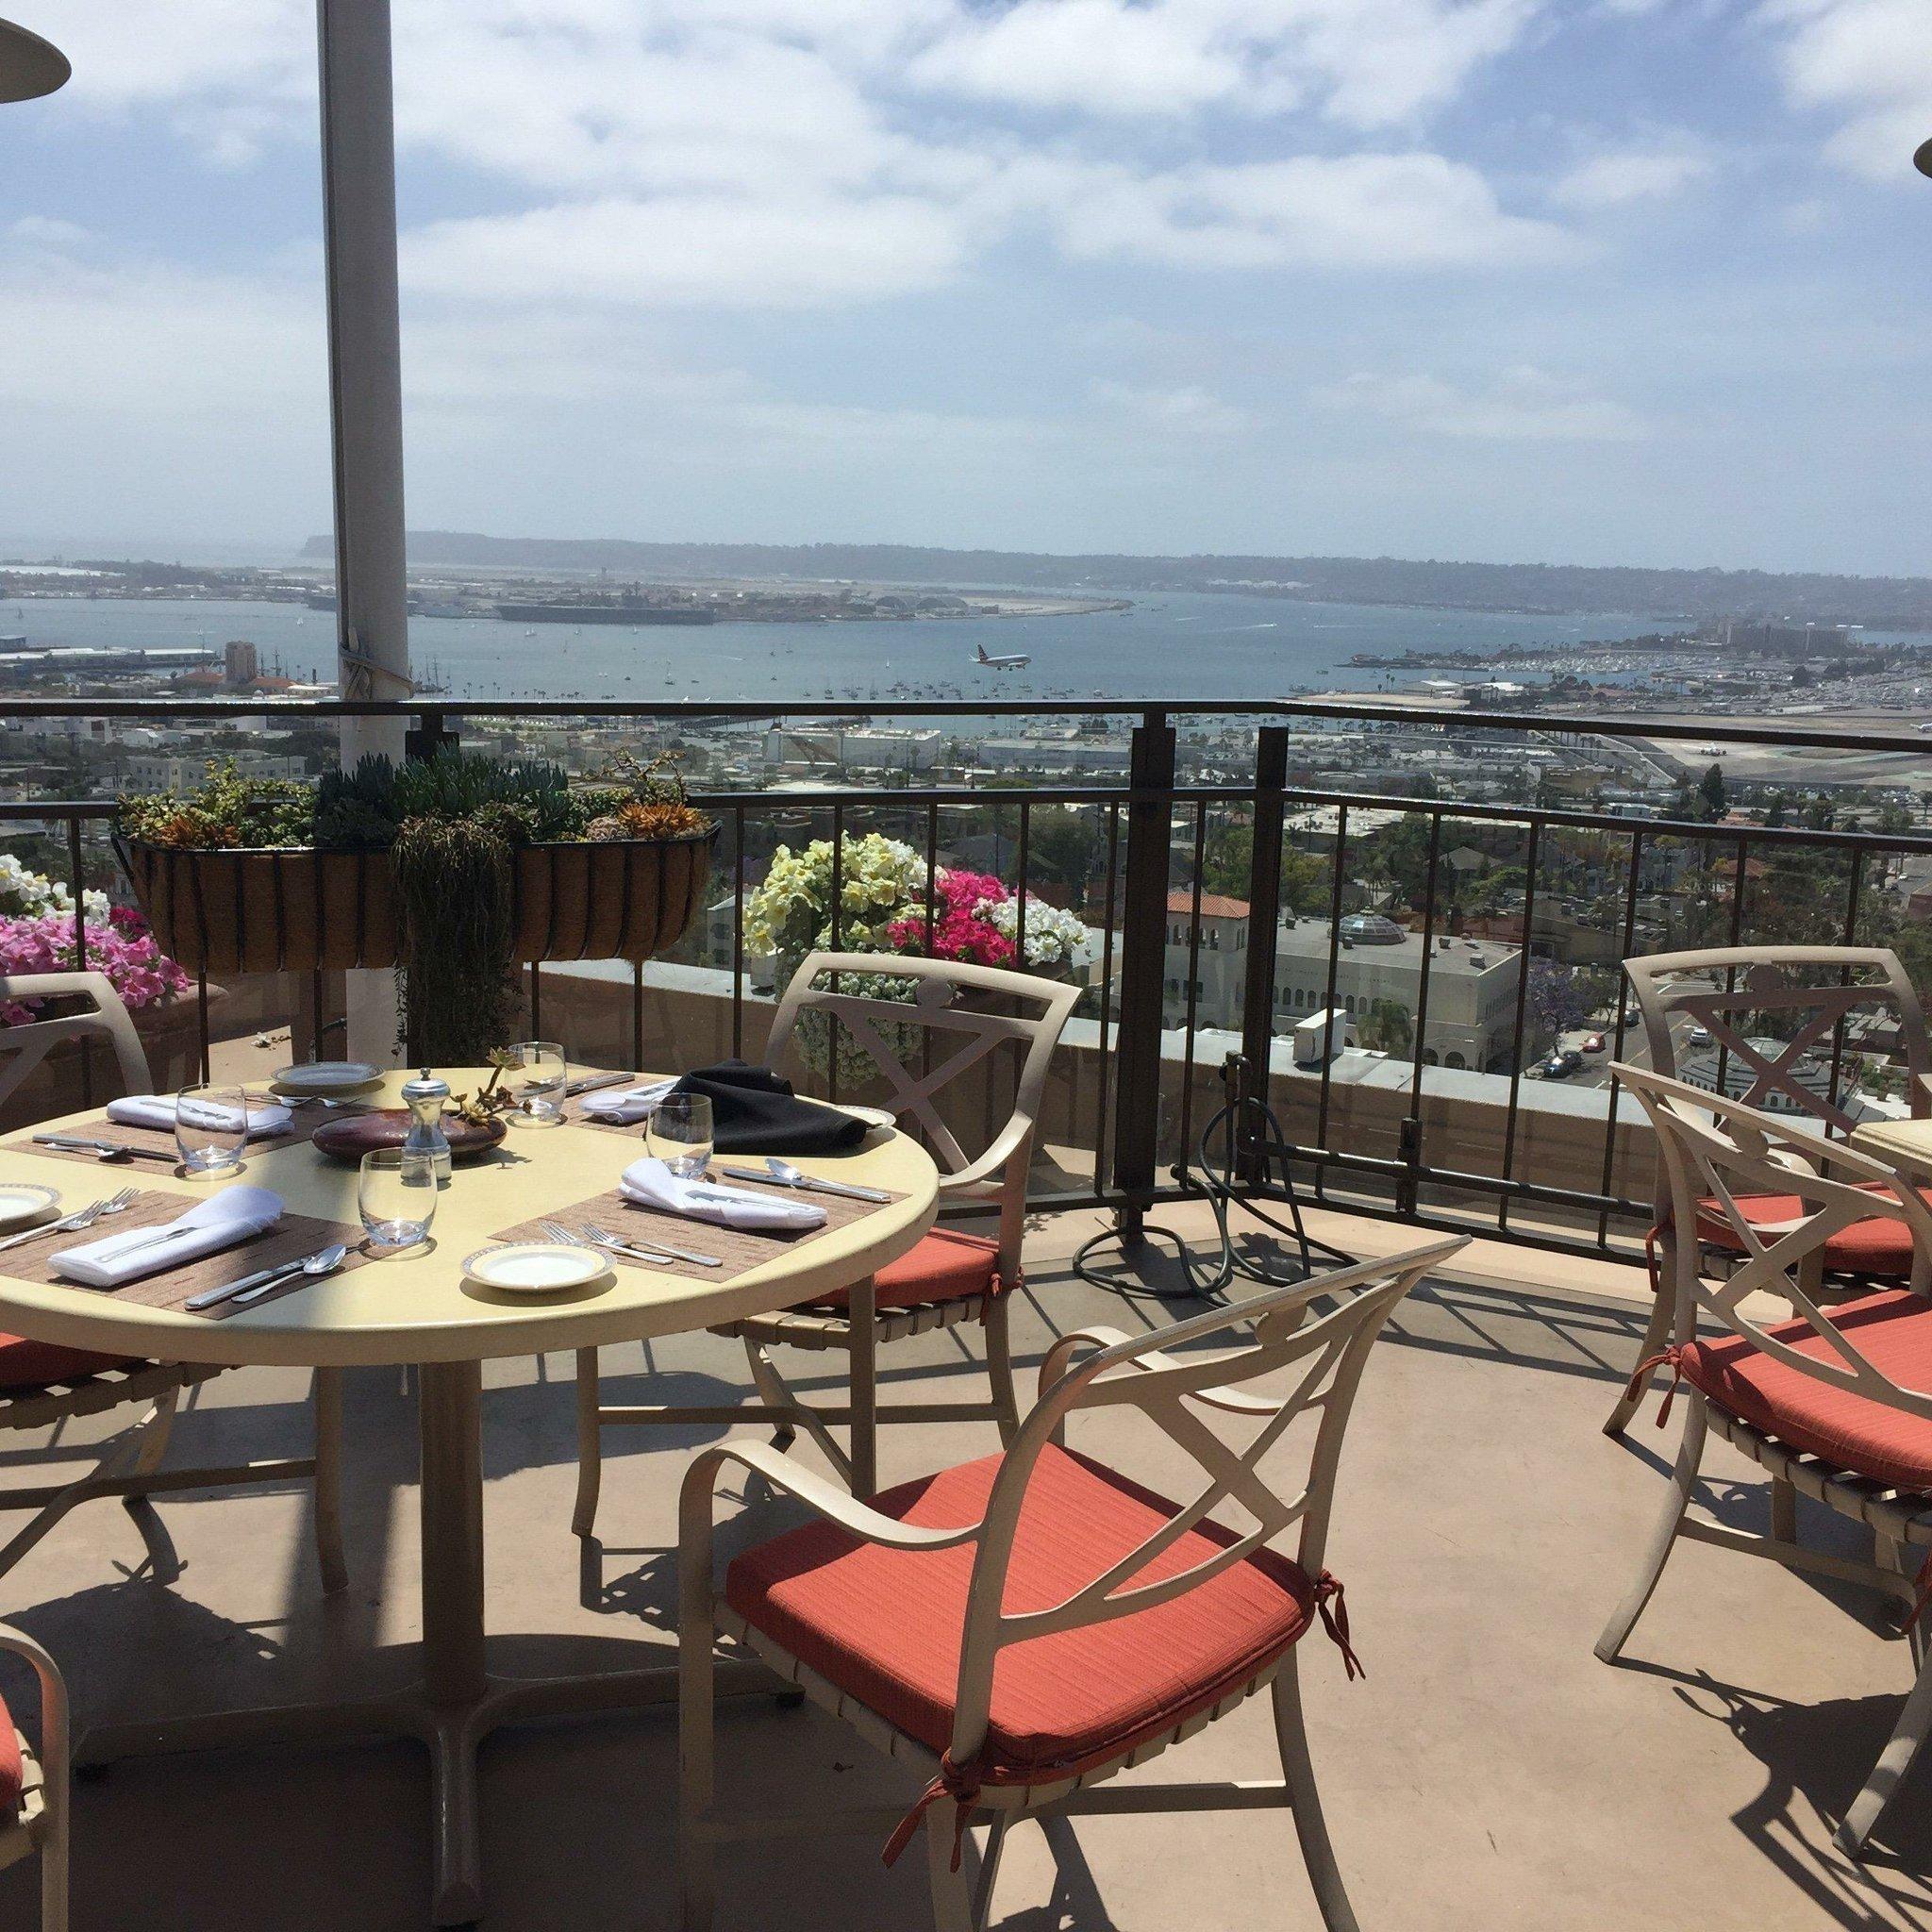 Best Restaurants For Sunset Views The San Go Union Tribune